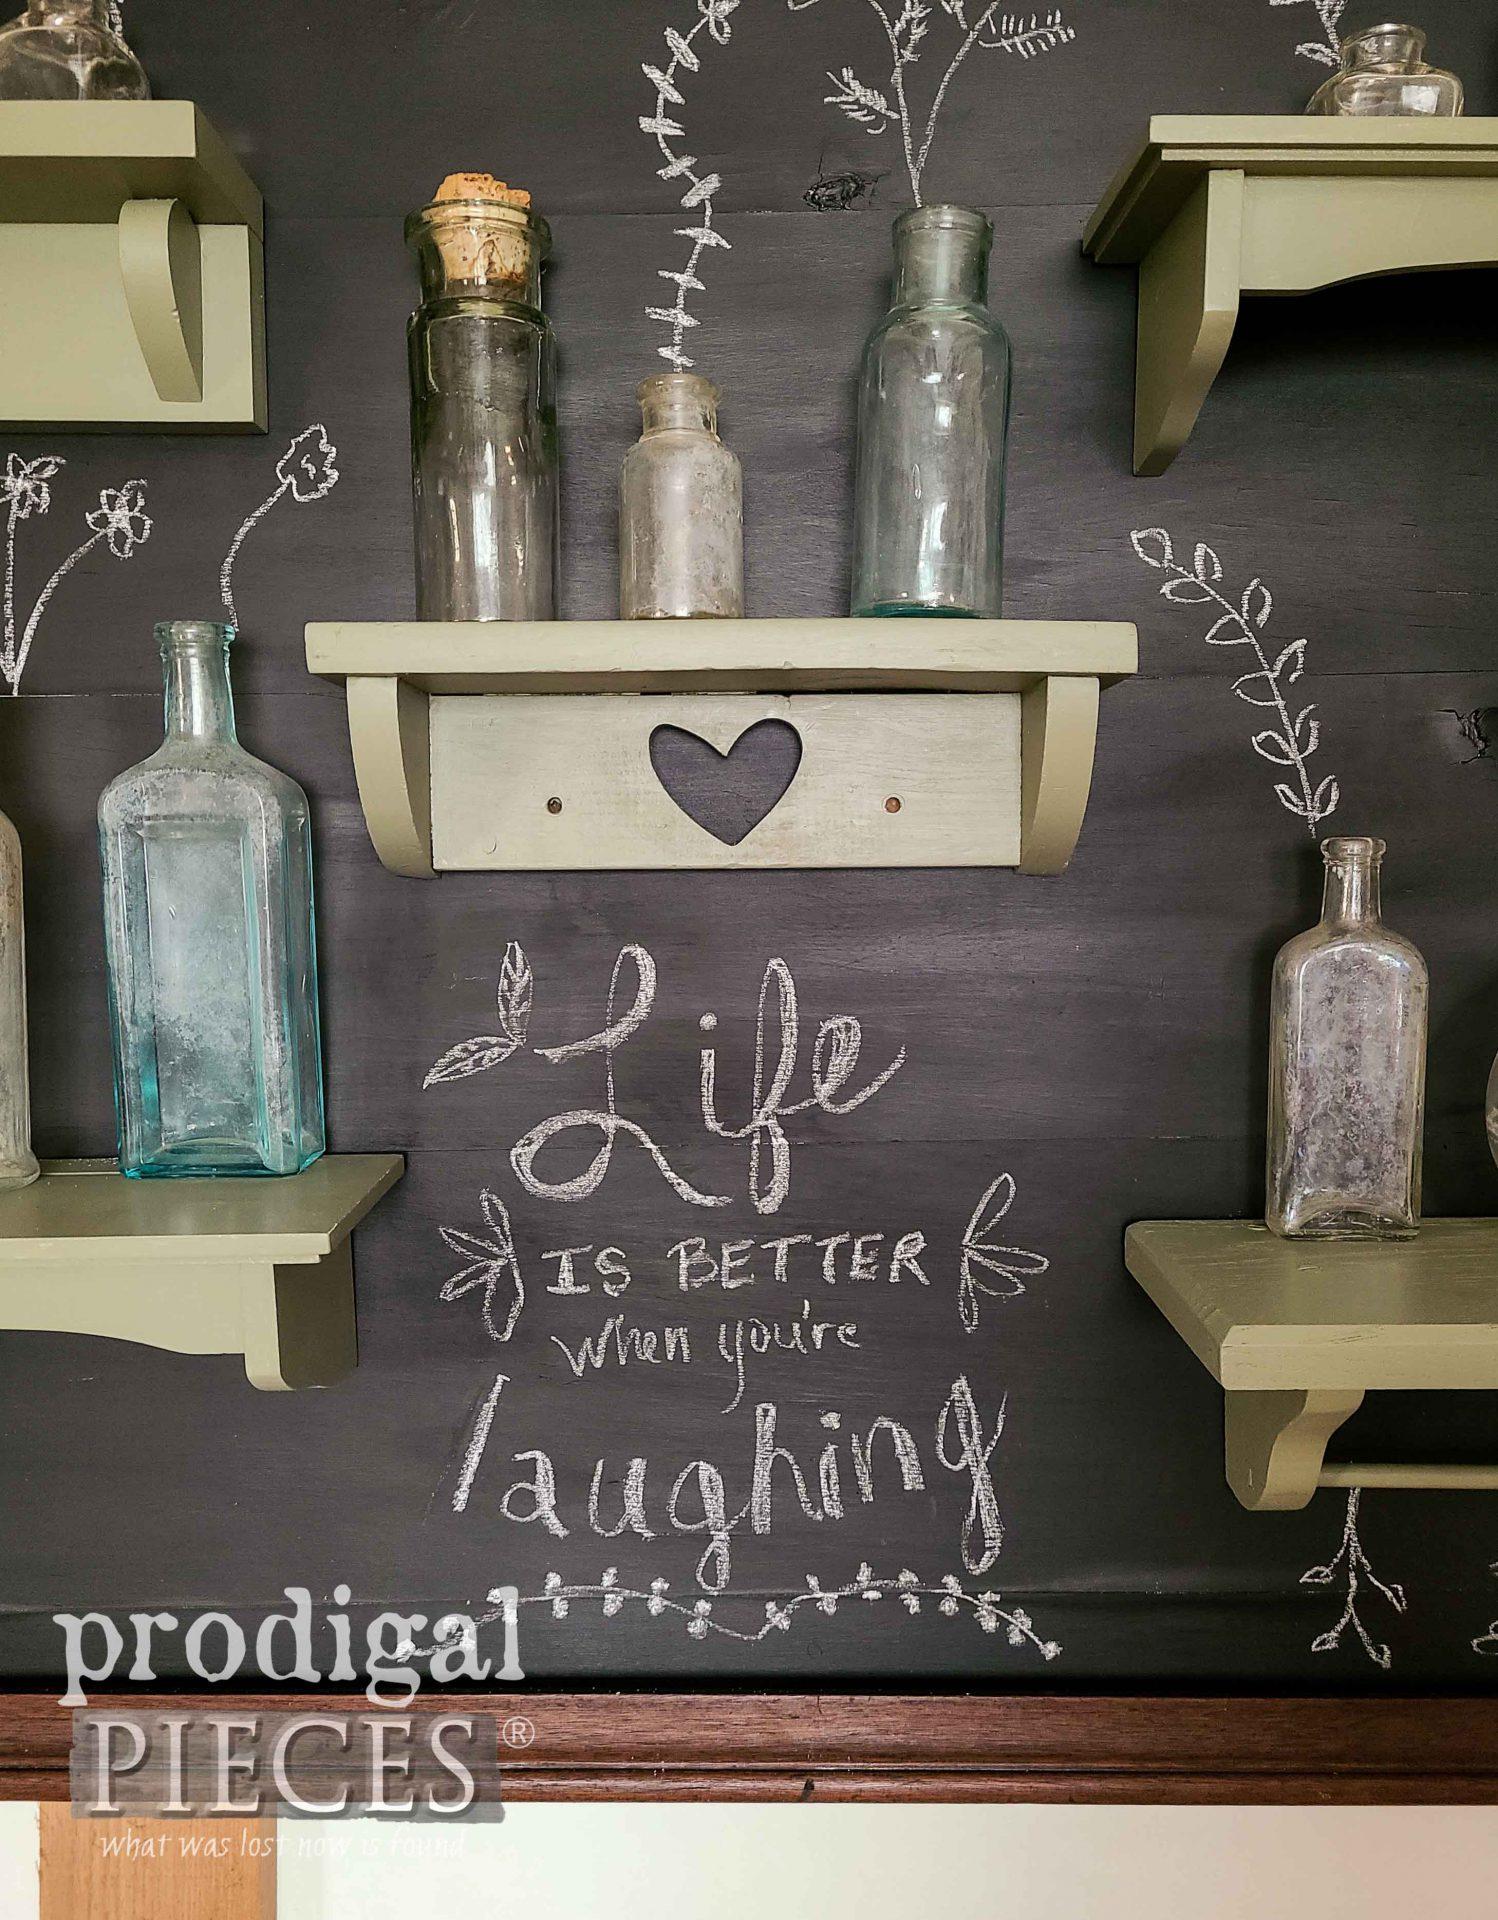 Chalkboard Art by Larissa of Prodigal Pieces | prodigalpieces.com #prodigalpieces #chalkboard #diy #home